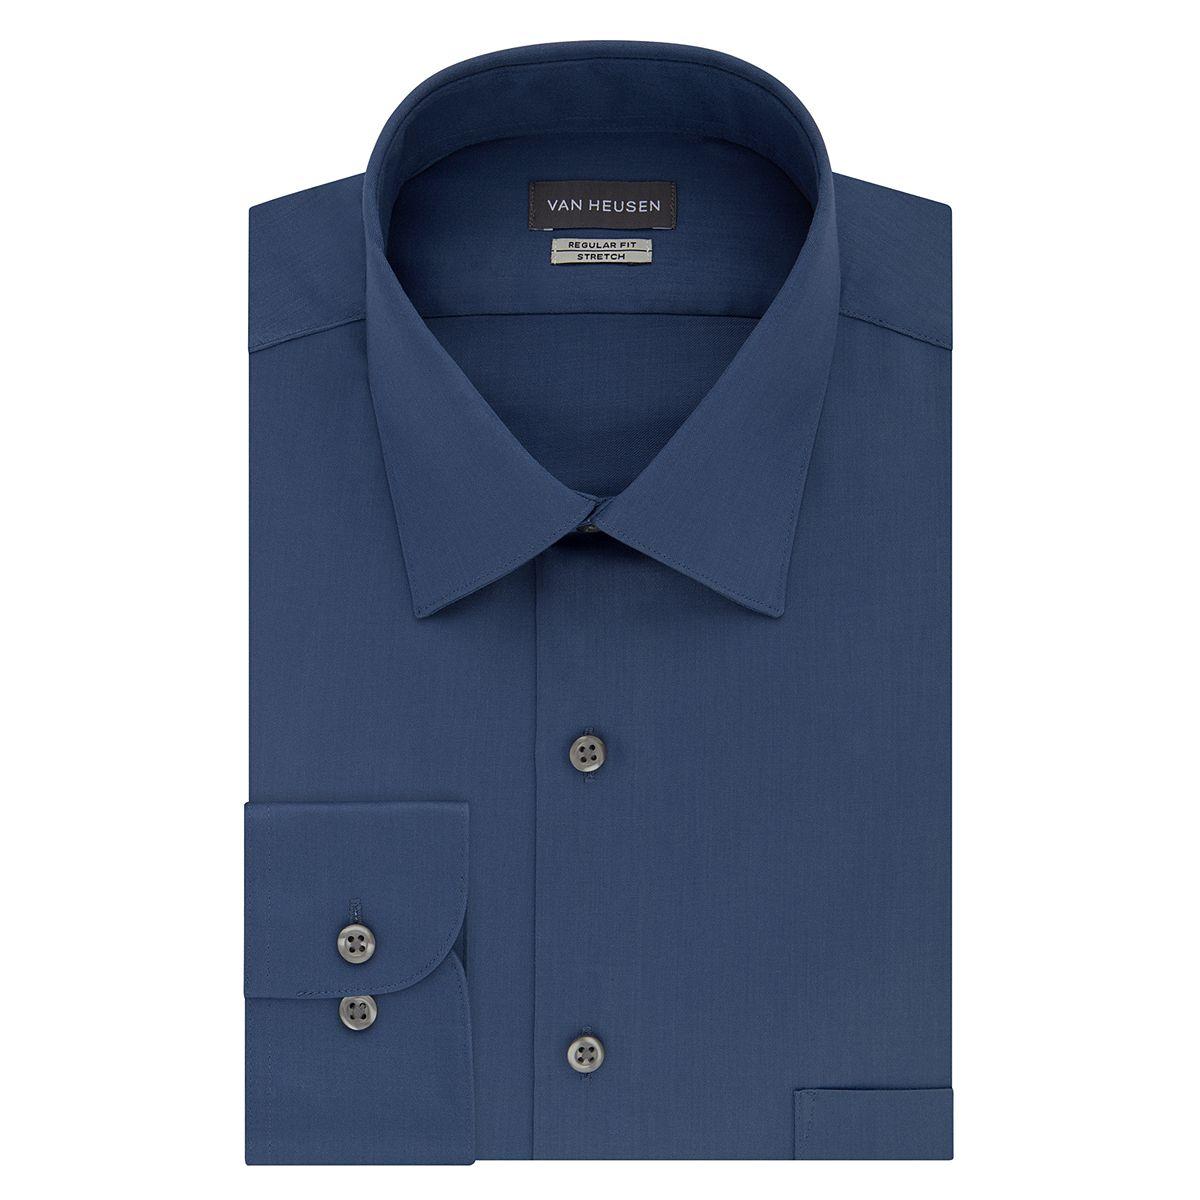 Van Heusen Slim-Fit Lux Sateen Stretch Sateen Dress Mens Shirt